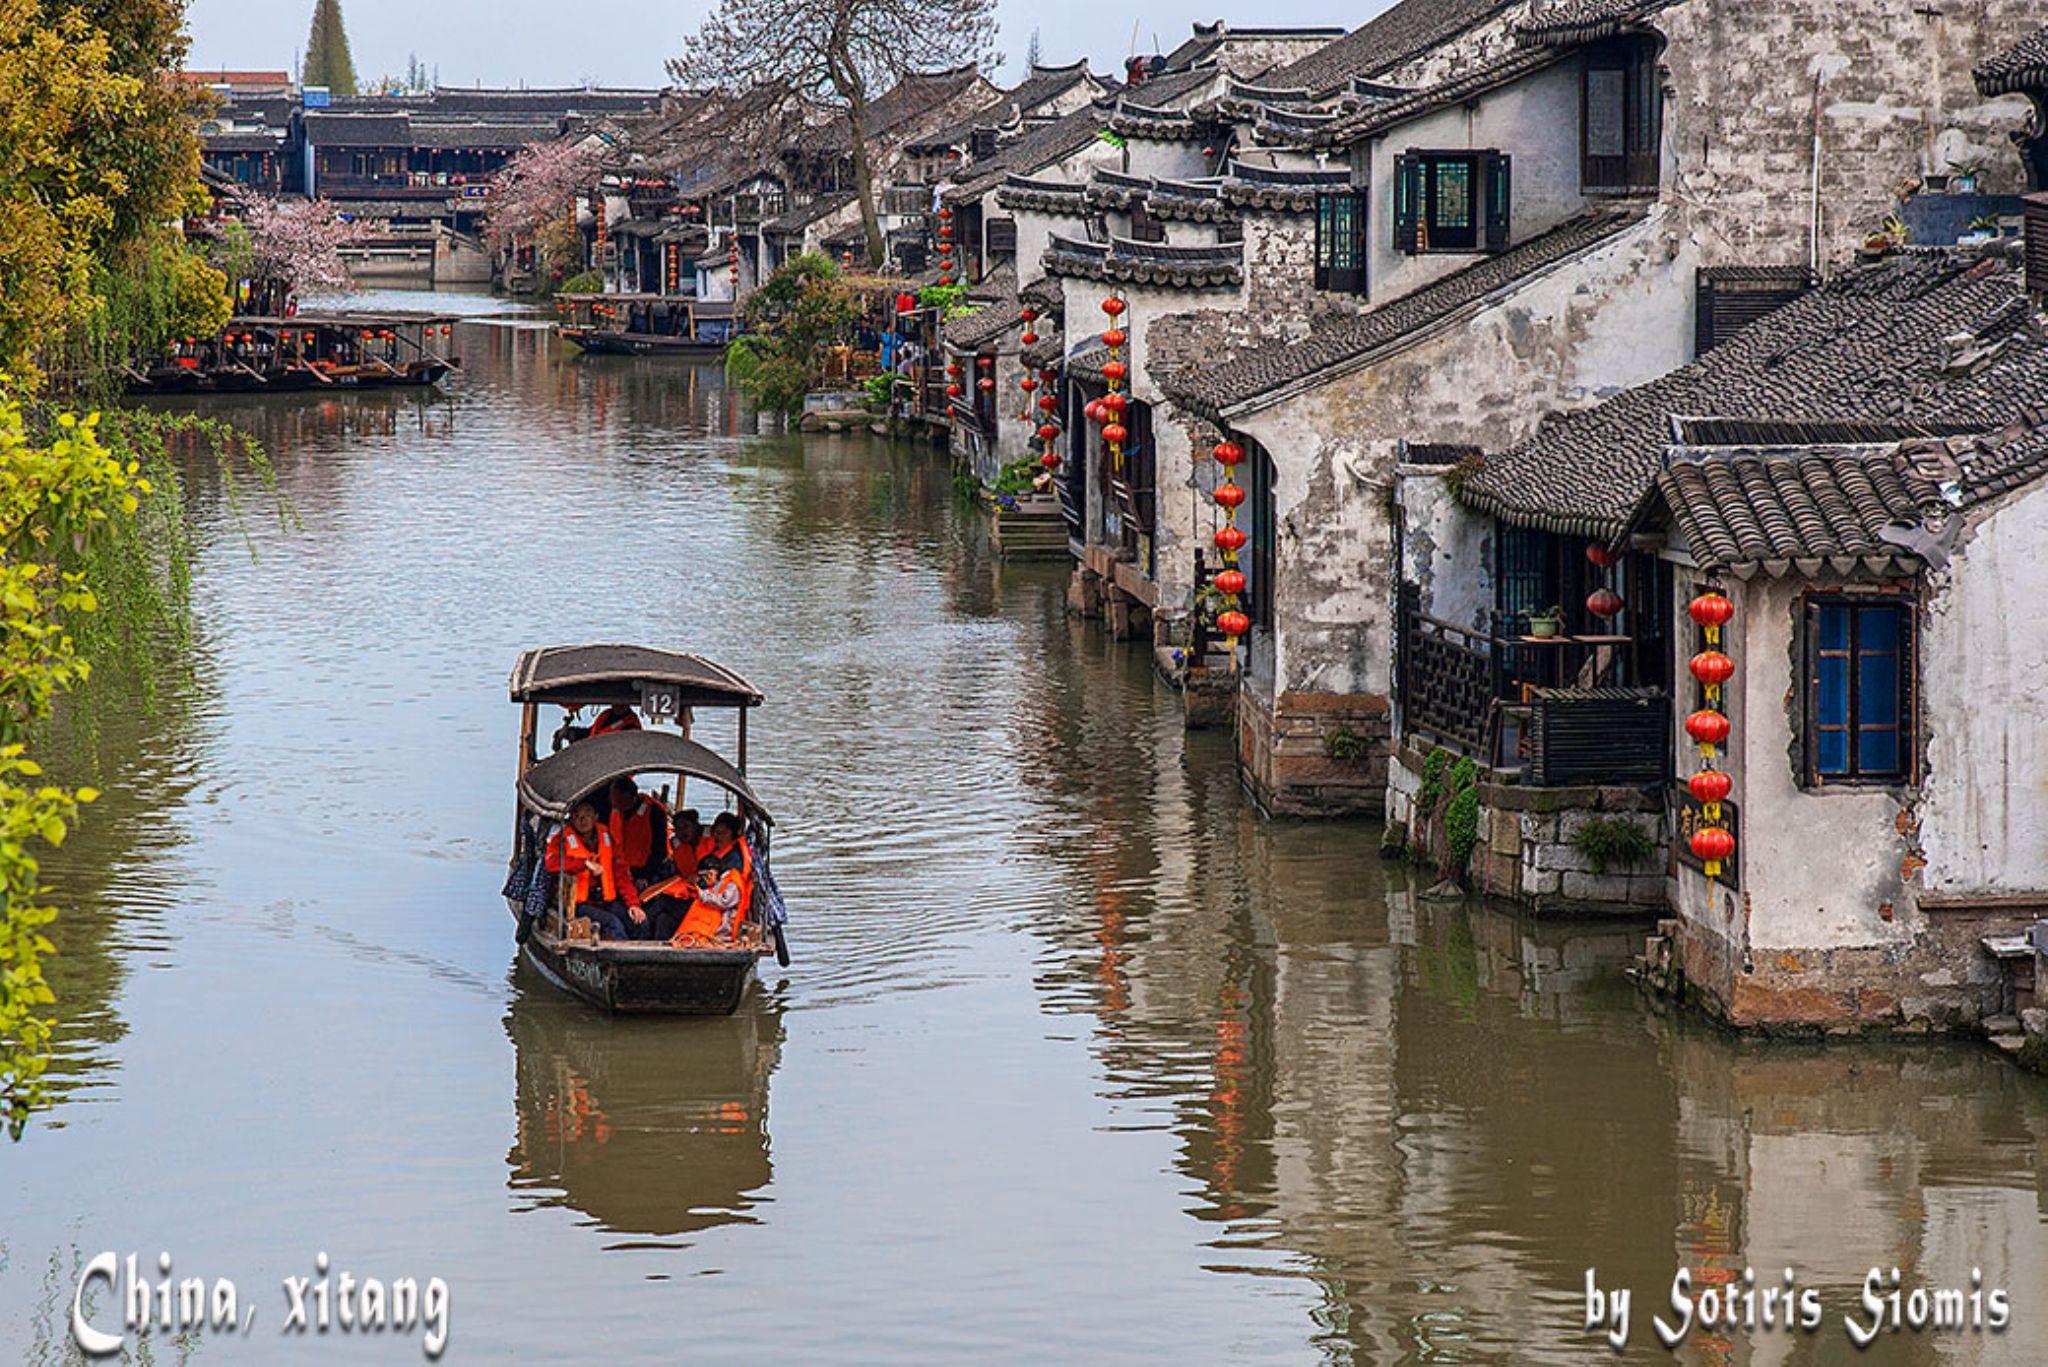 XITANG, CHINA by Sotiris Siomis